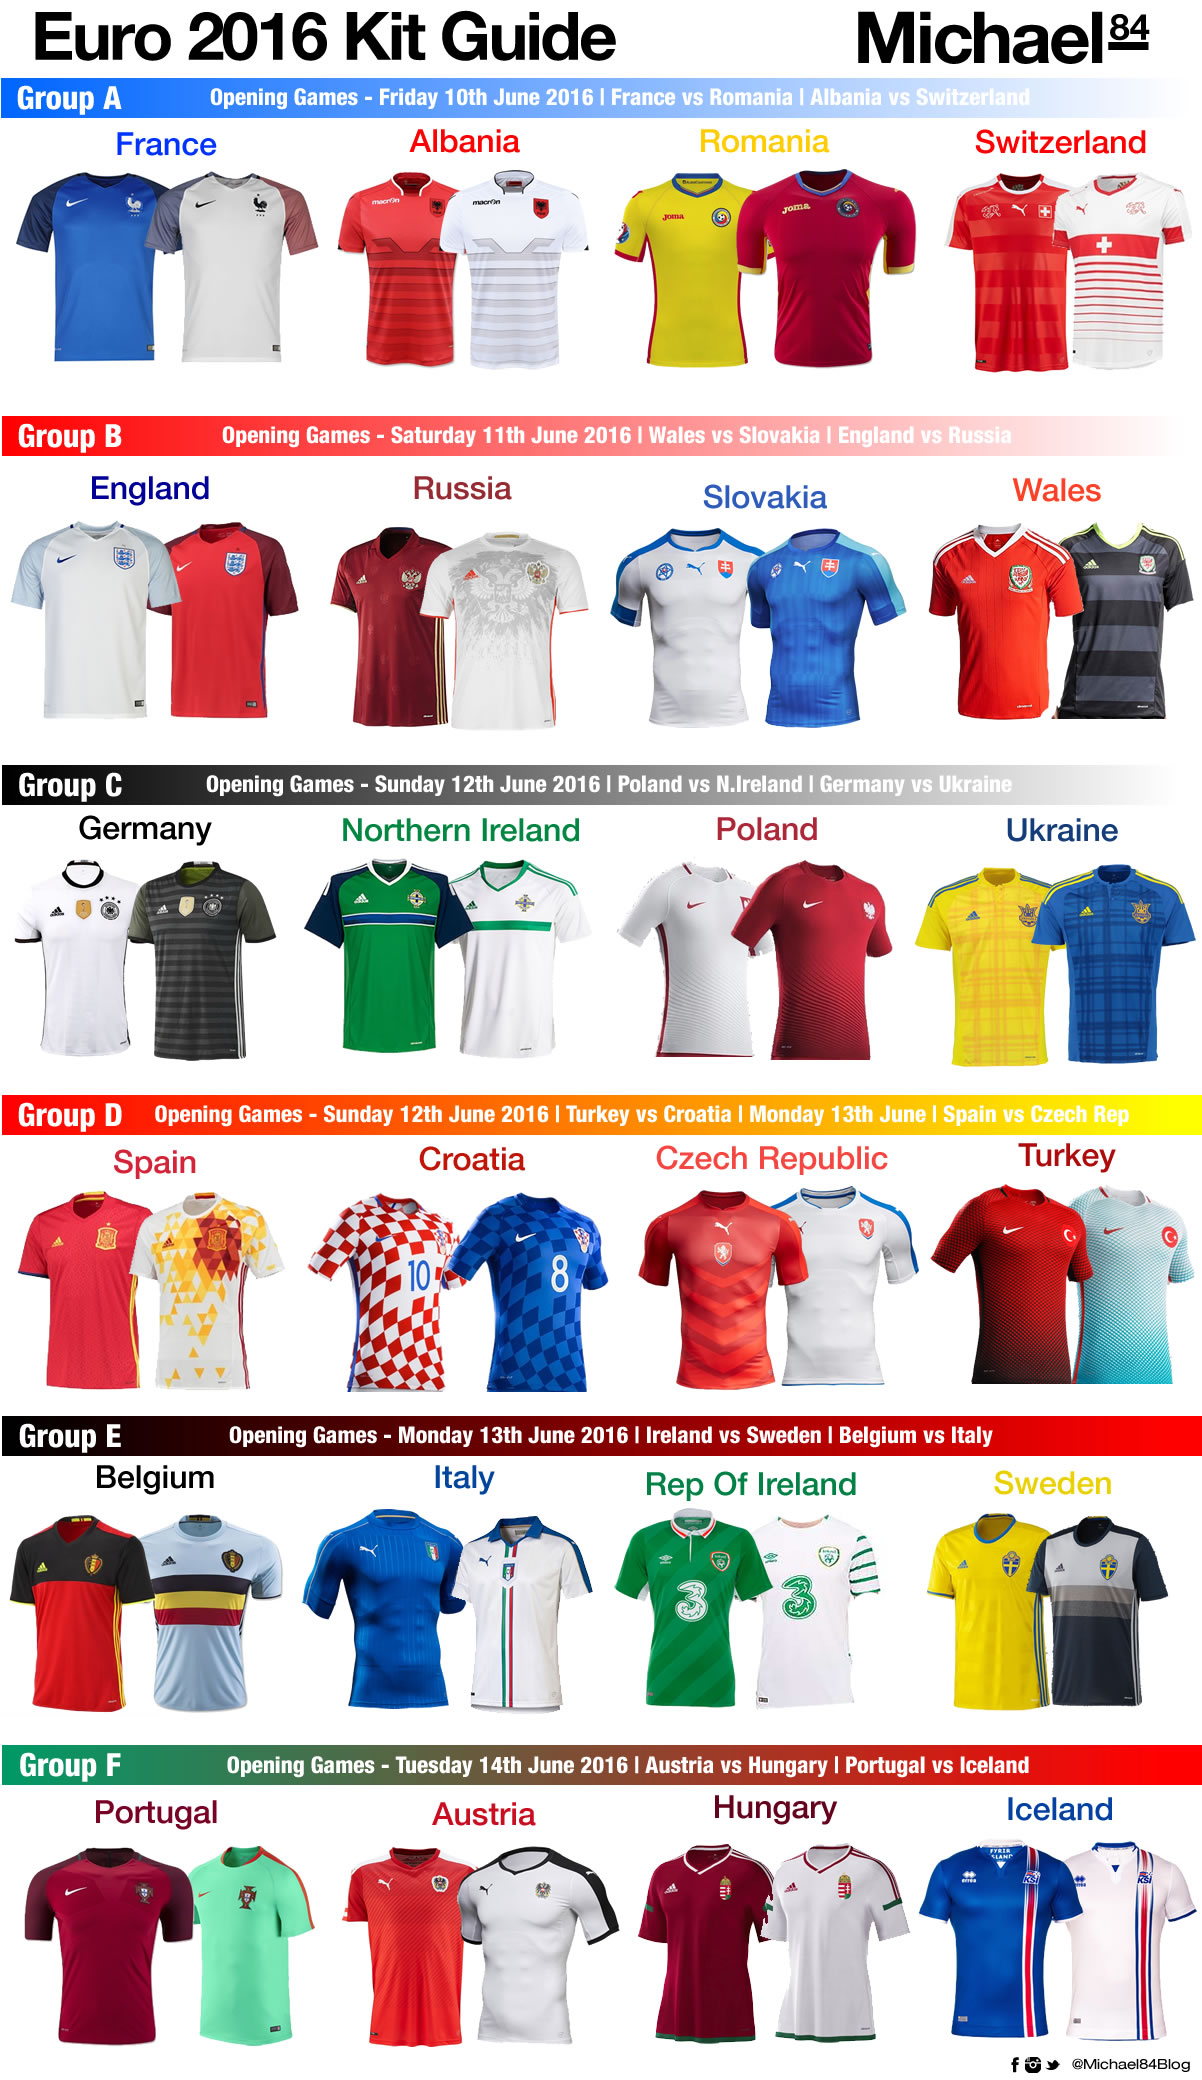 euro2016-kit-guide-home-away-shirts